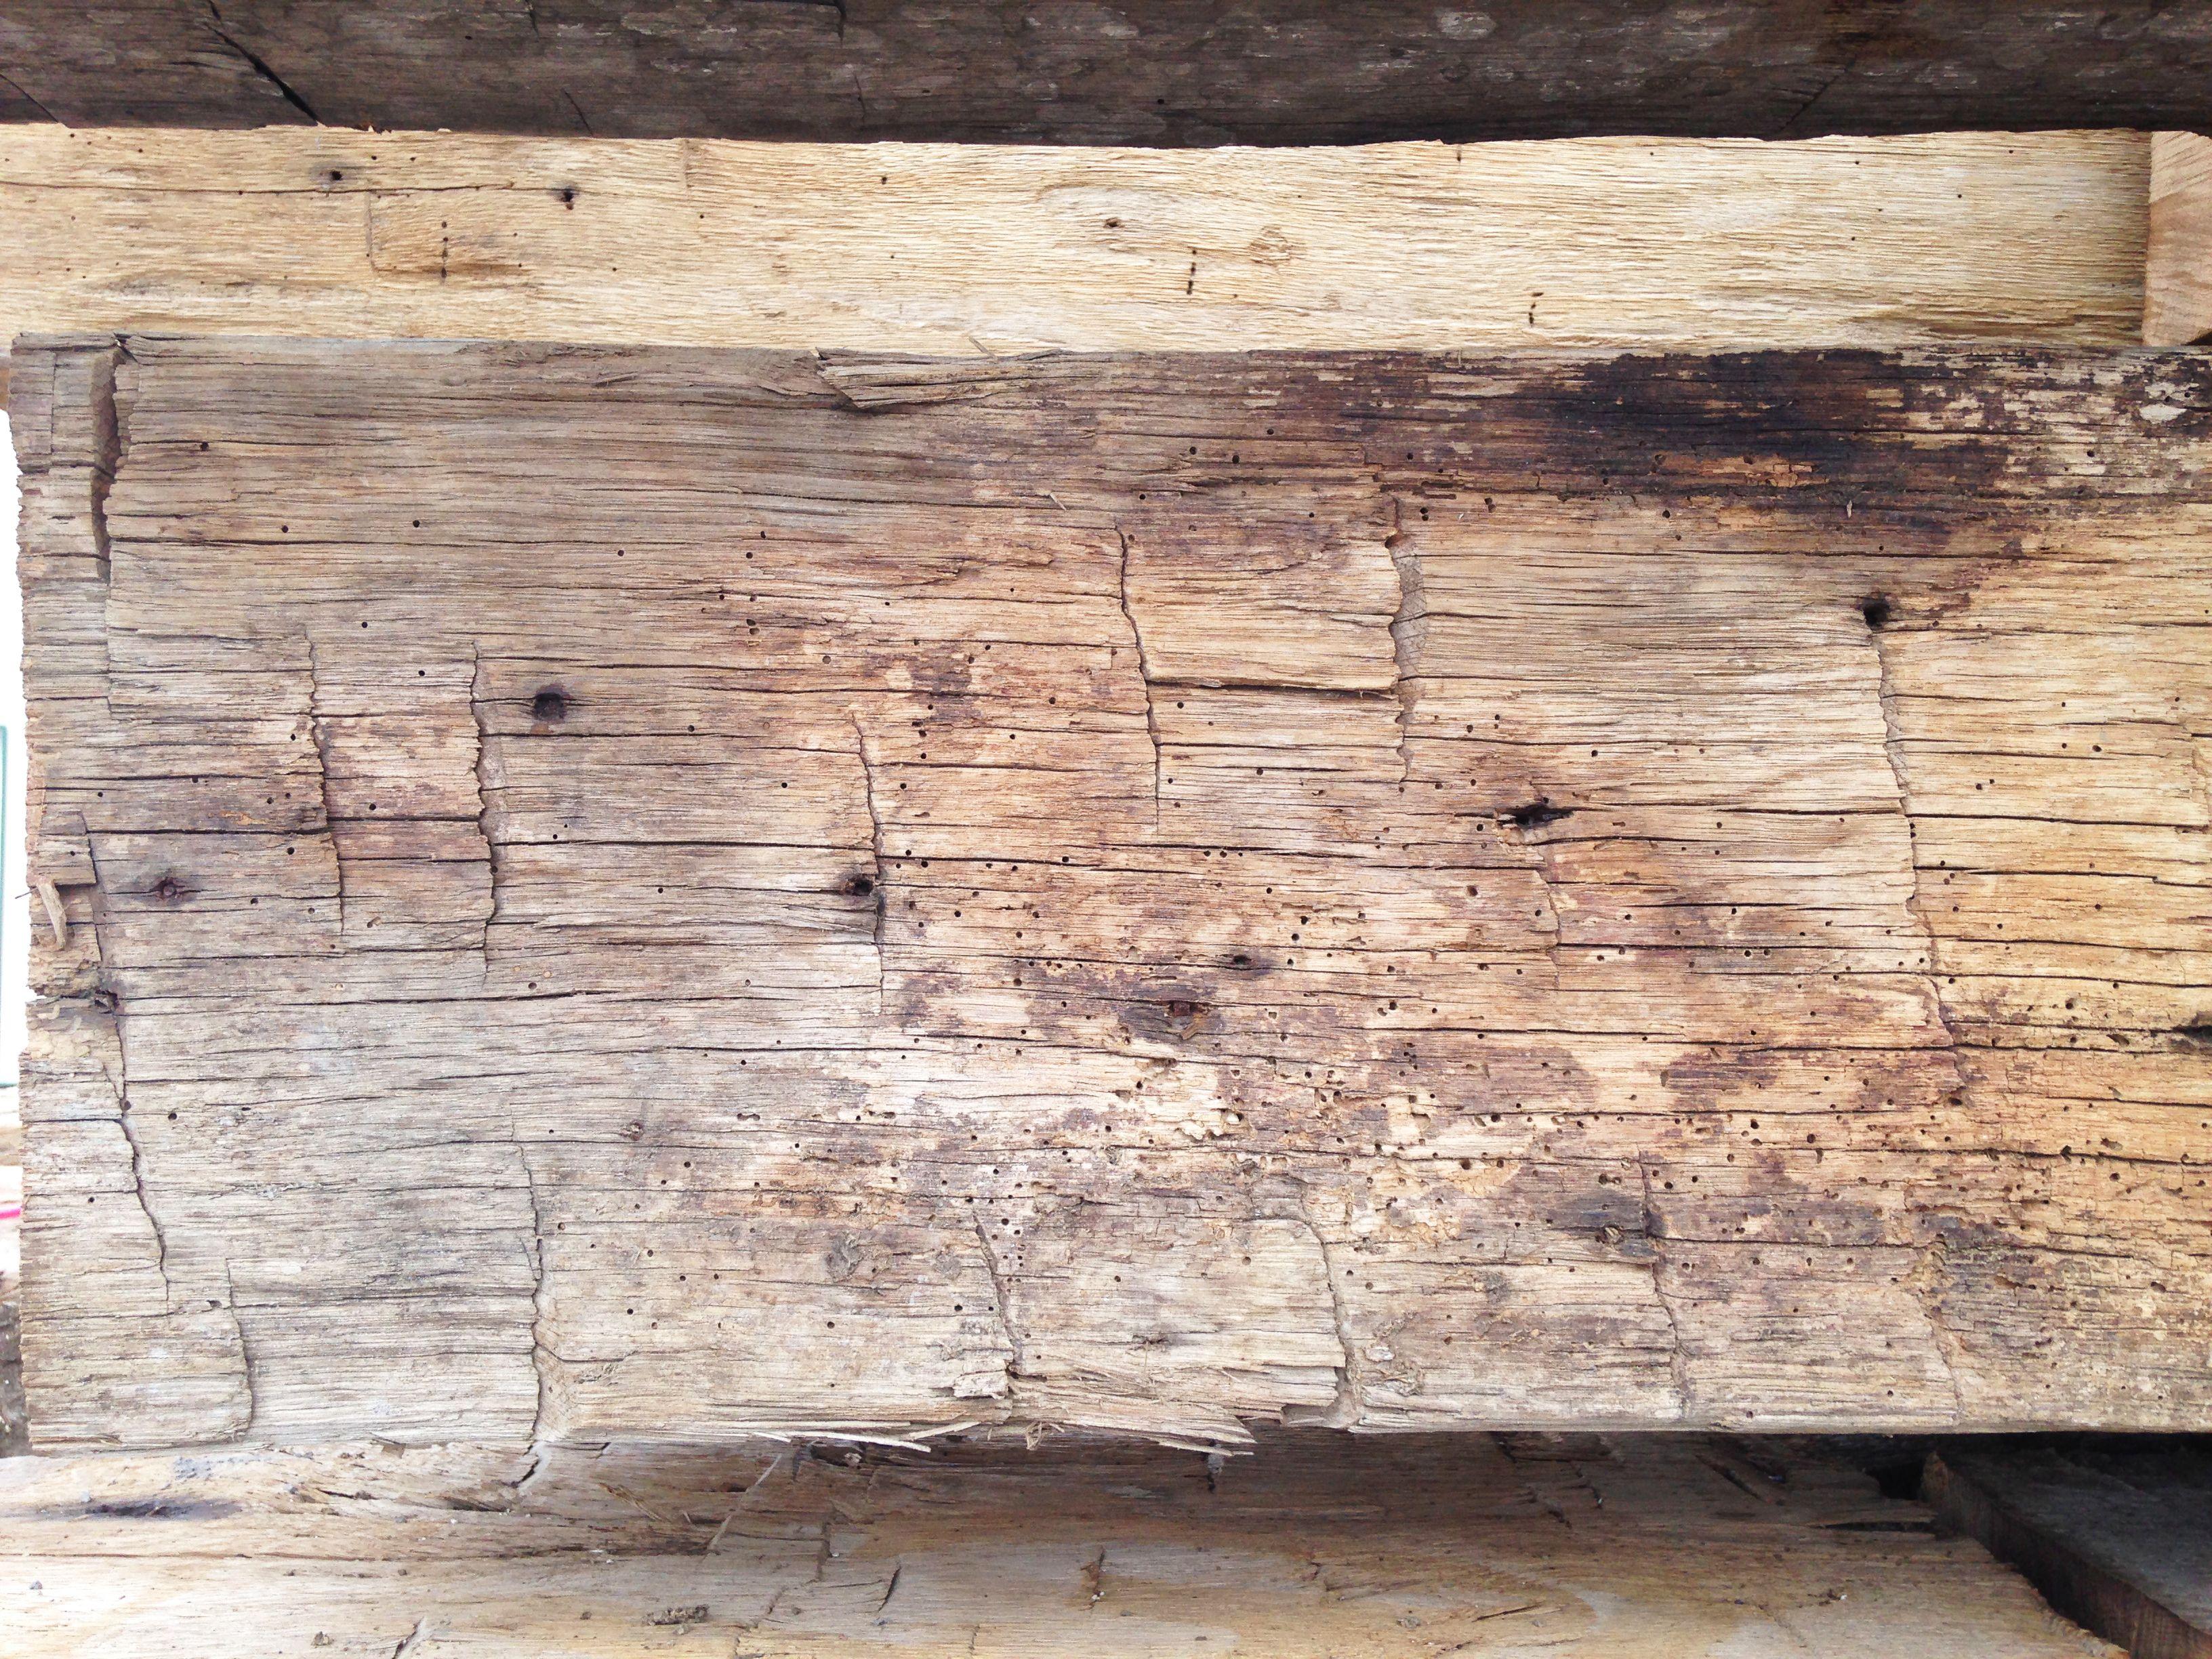 Antique Oak Beam Buckeyehardwoods Www Buckeyehardwoods Com Https Www Facebook Com Buckeyehardwoods Hardwood Lumber Reclaimed Projects Lumber